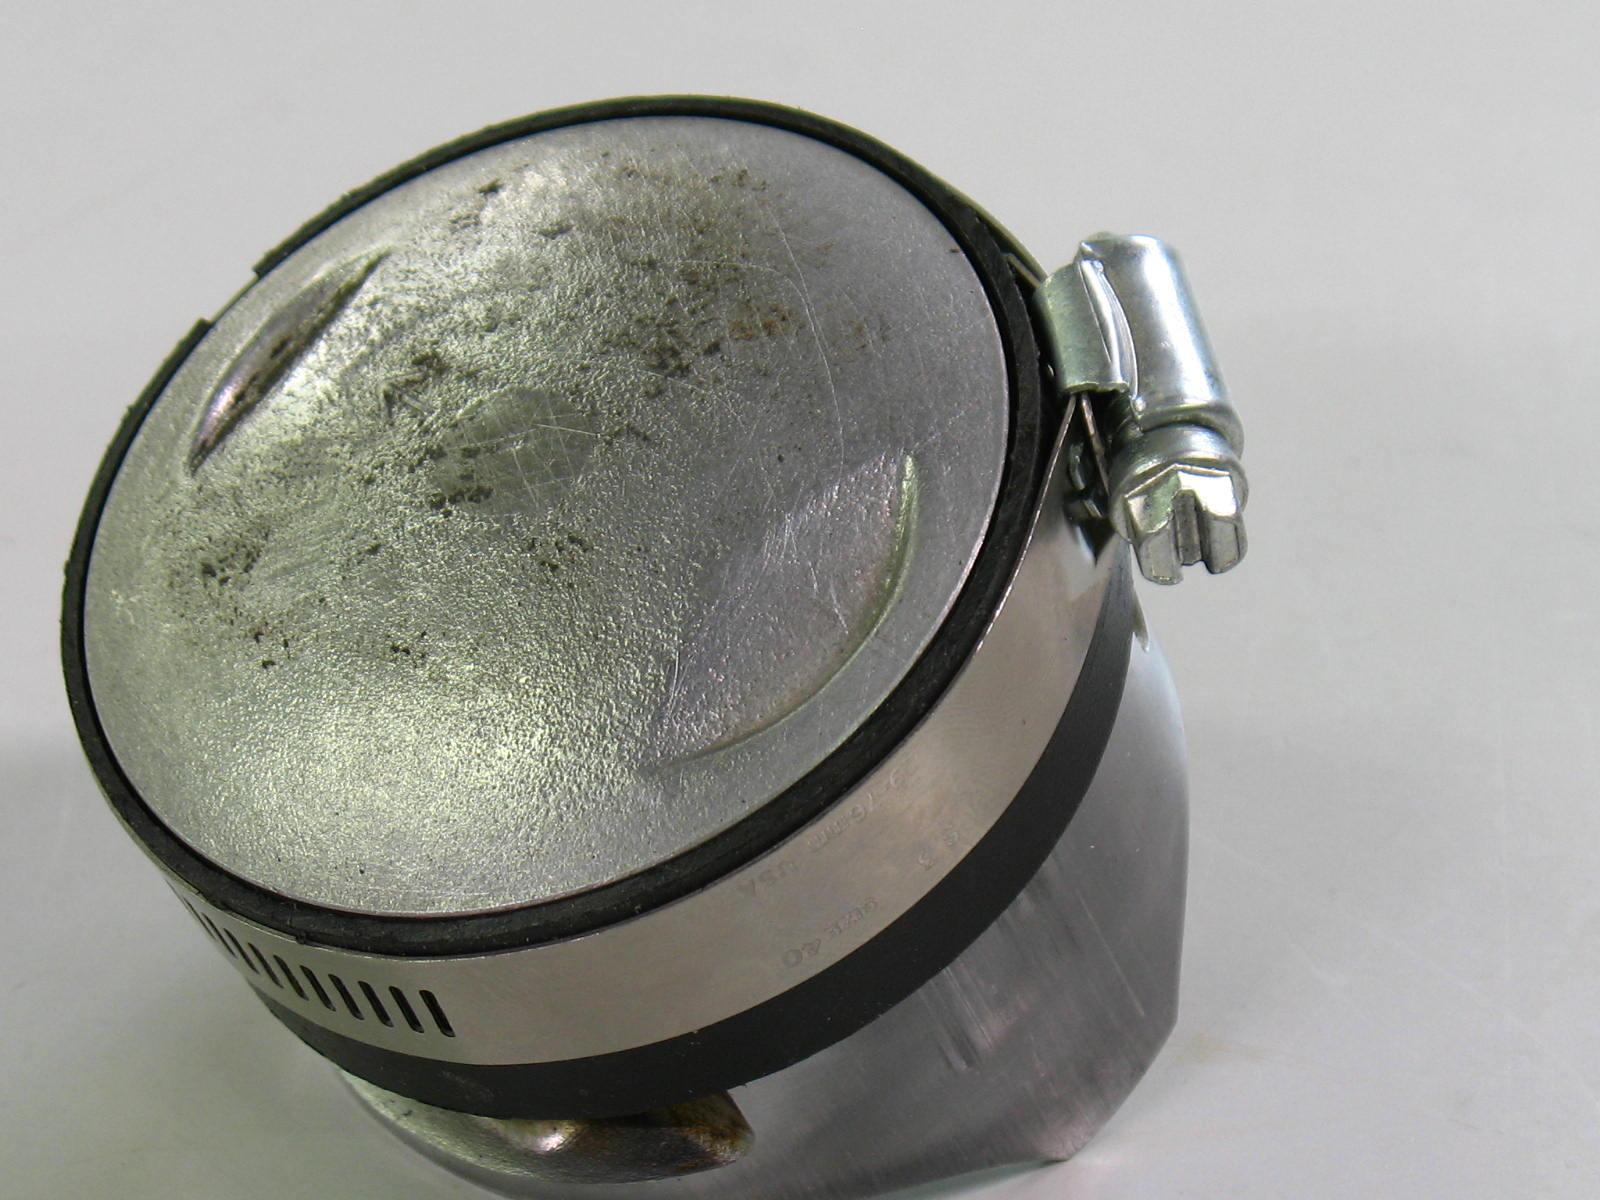 Kawasaki ring compressor - Page 2 - KZRider Forum - KZRider, KZ ... for Piston Ring Clamp  565ane